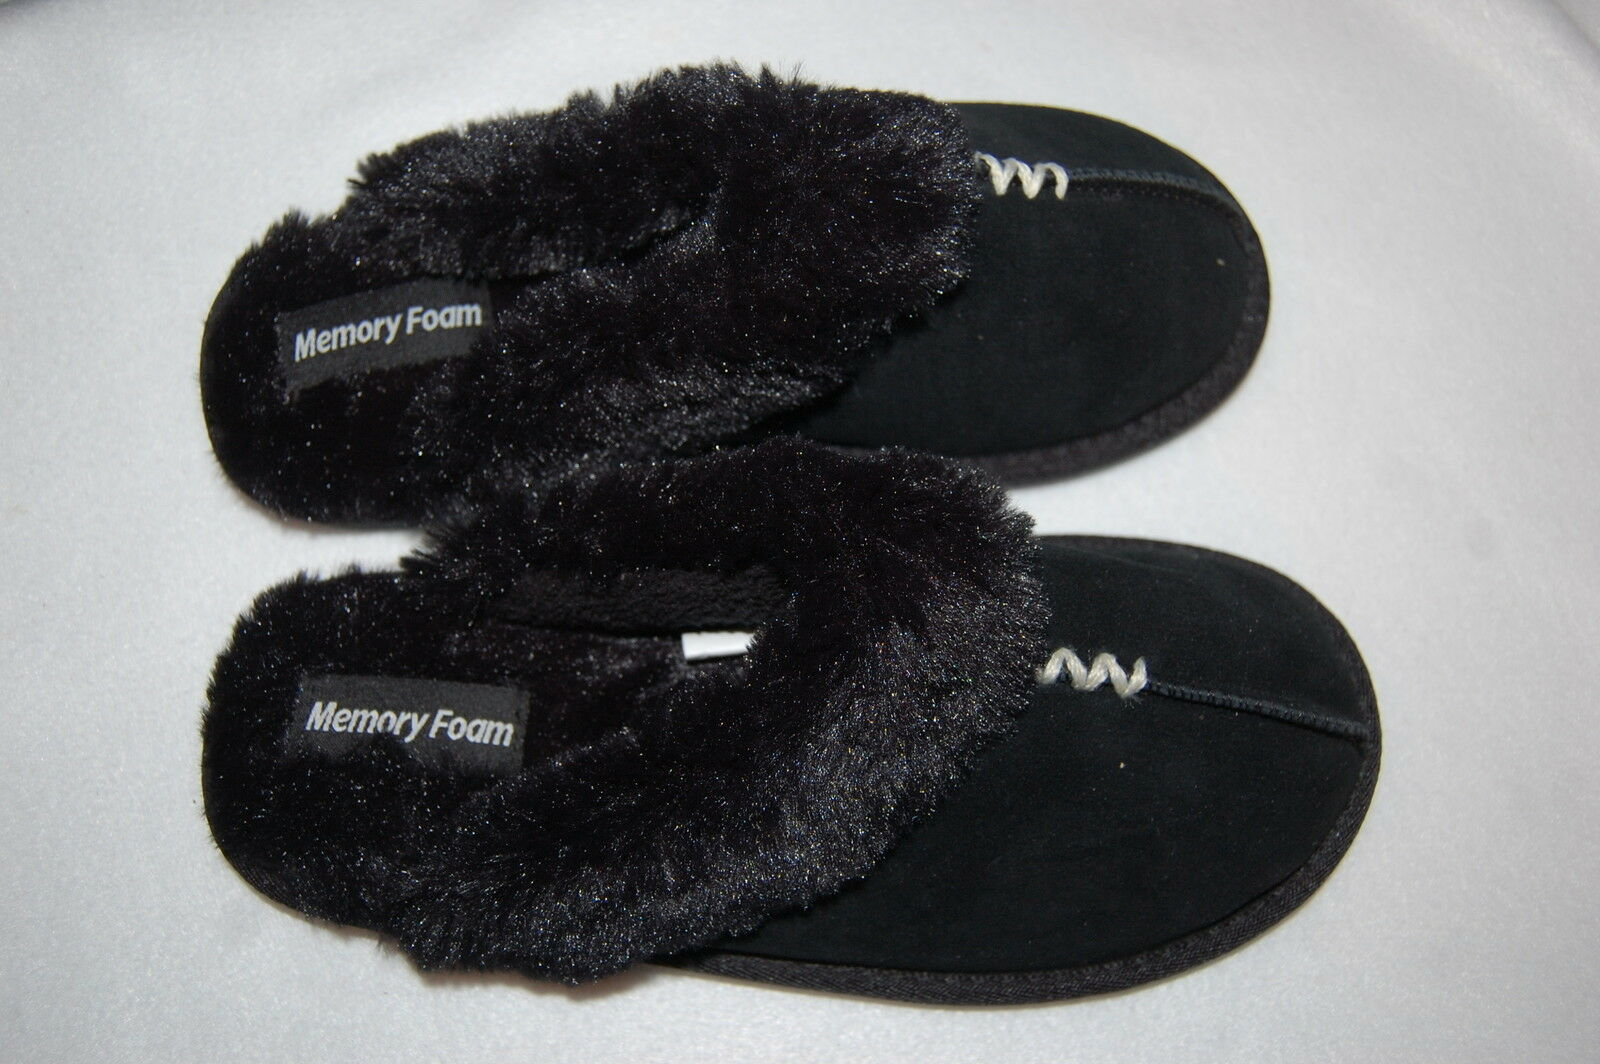 Womens Slippers BLACK LEATHER SLIP ON Faux Fur Trim MEMORY FOAM In-Outdoor S 5-6